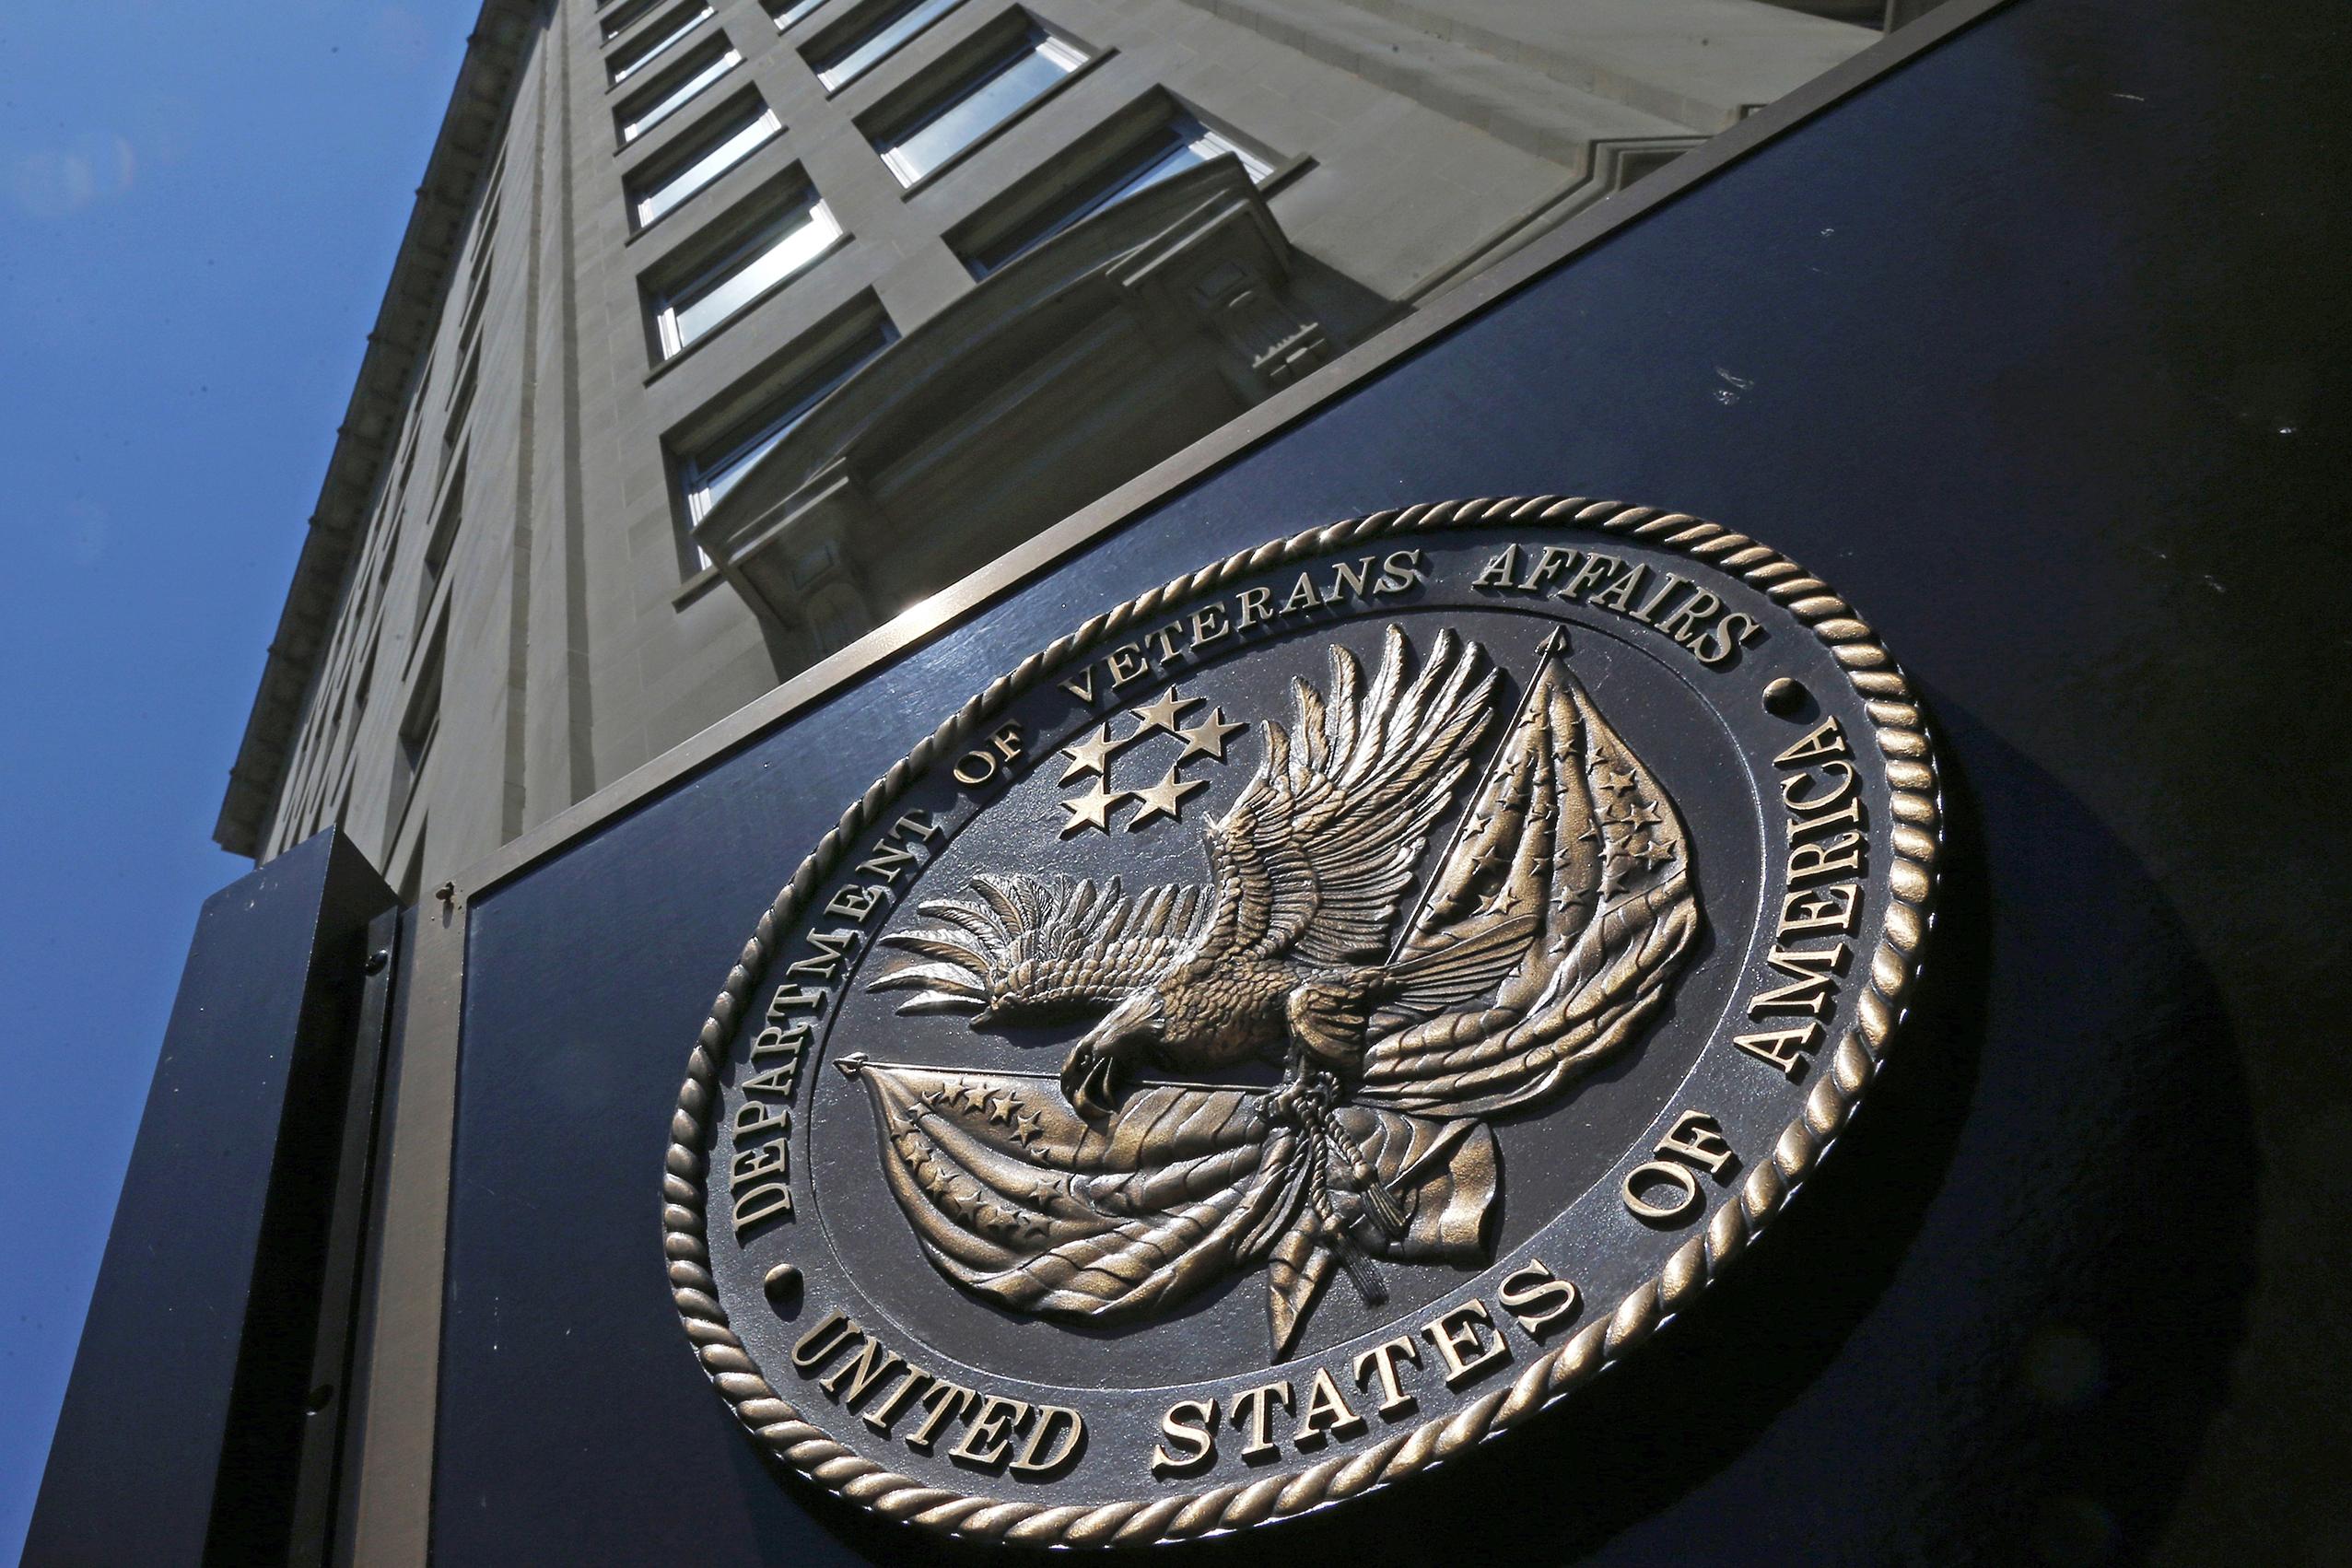 <p>The Department of Veterans Affairs building in Washington, D.C.</p>